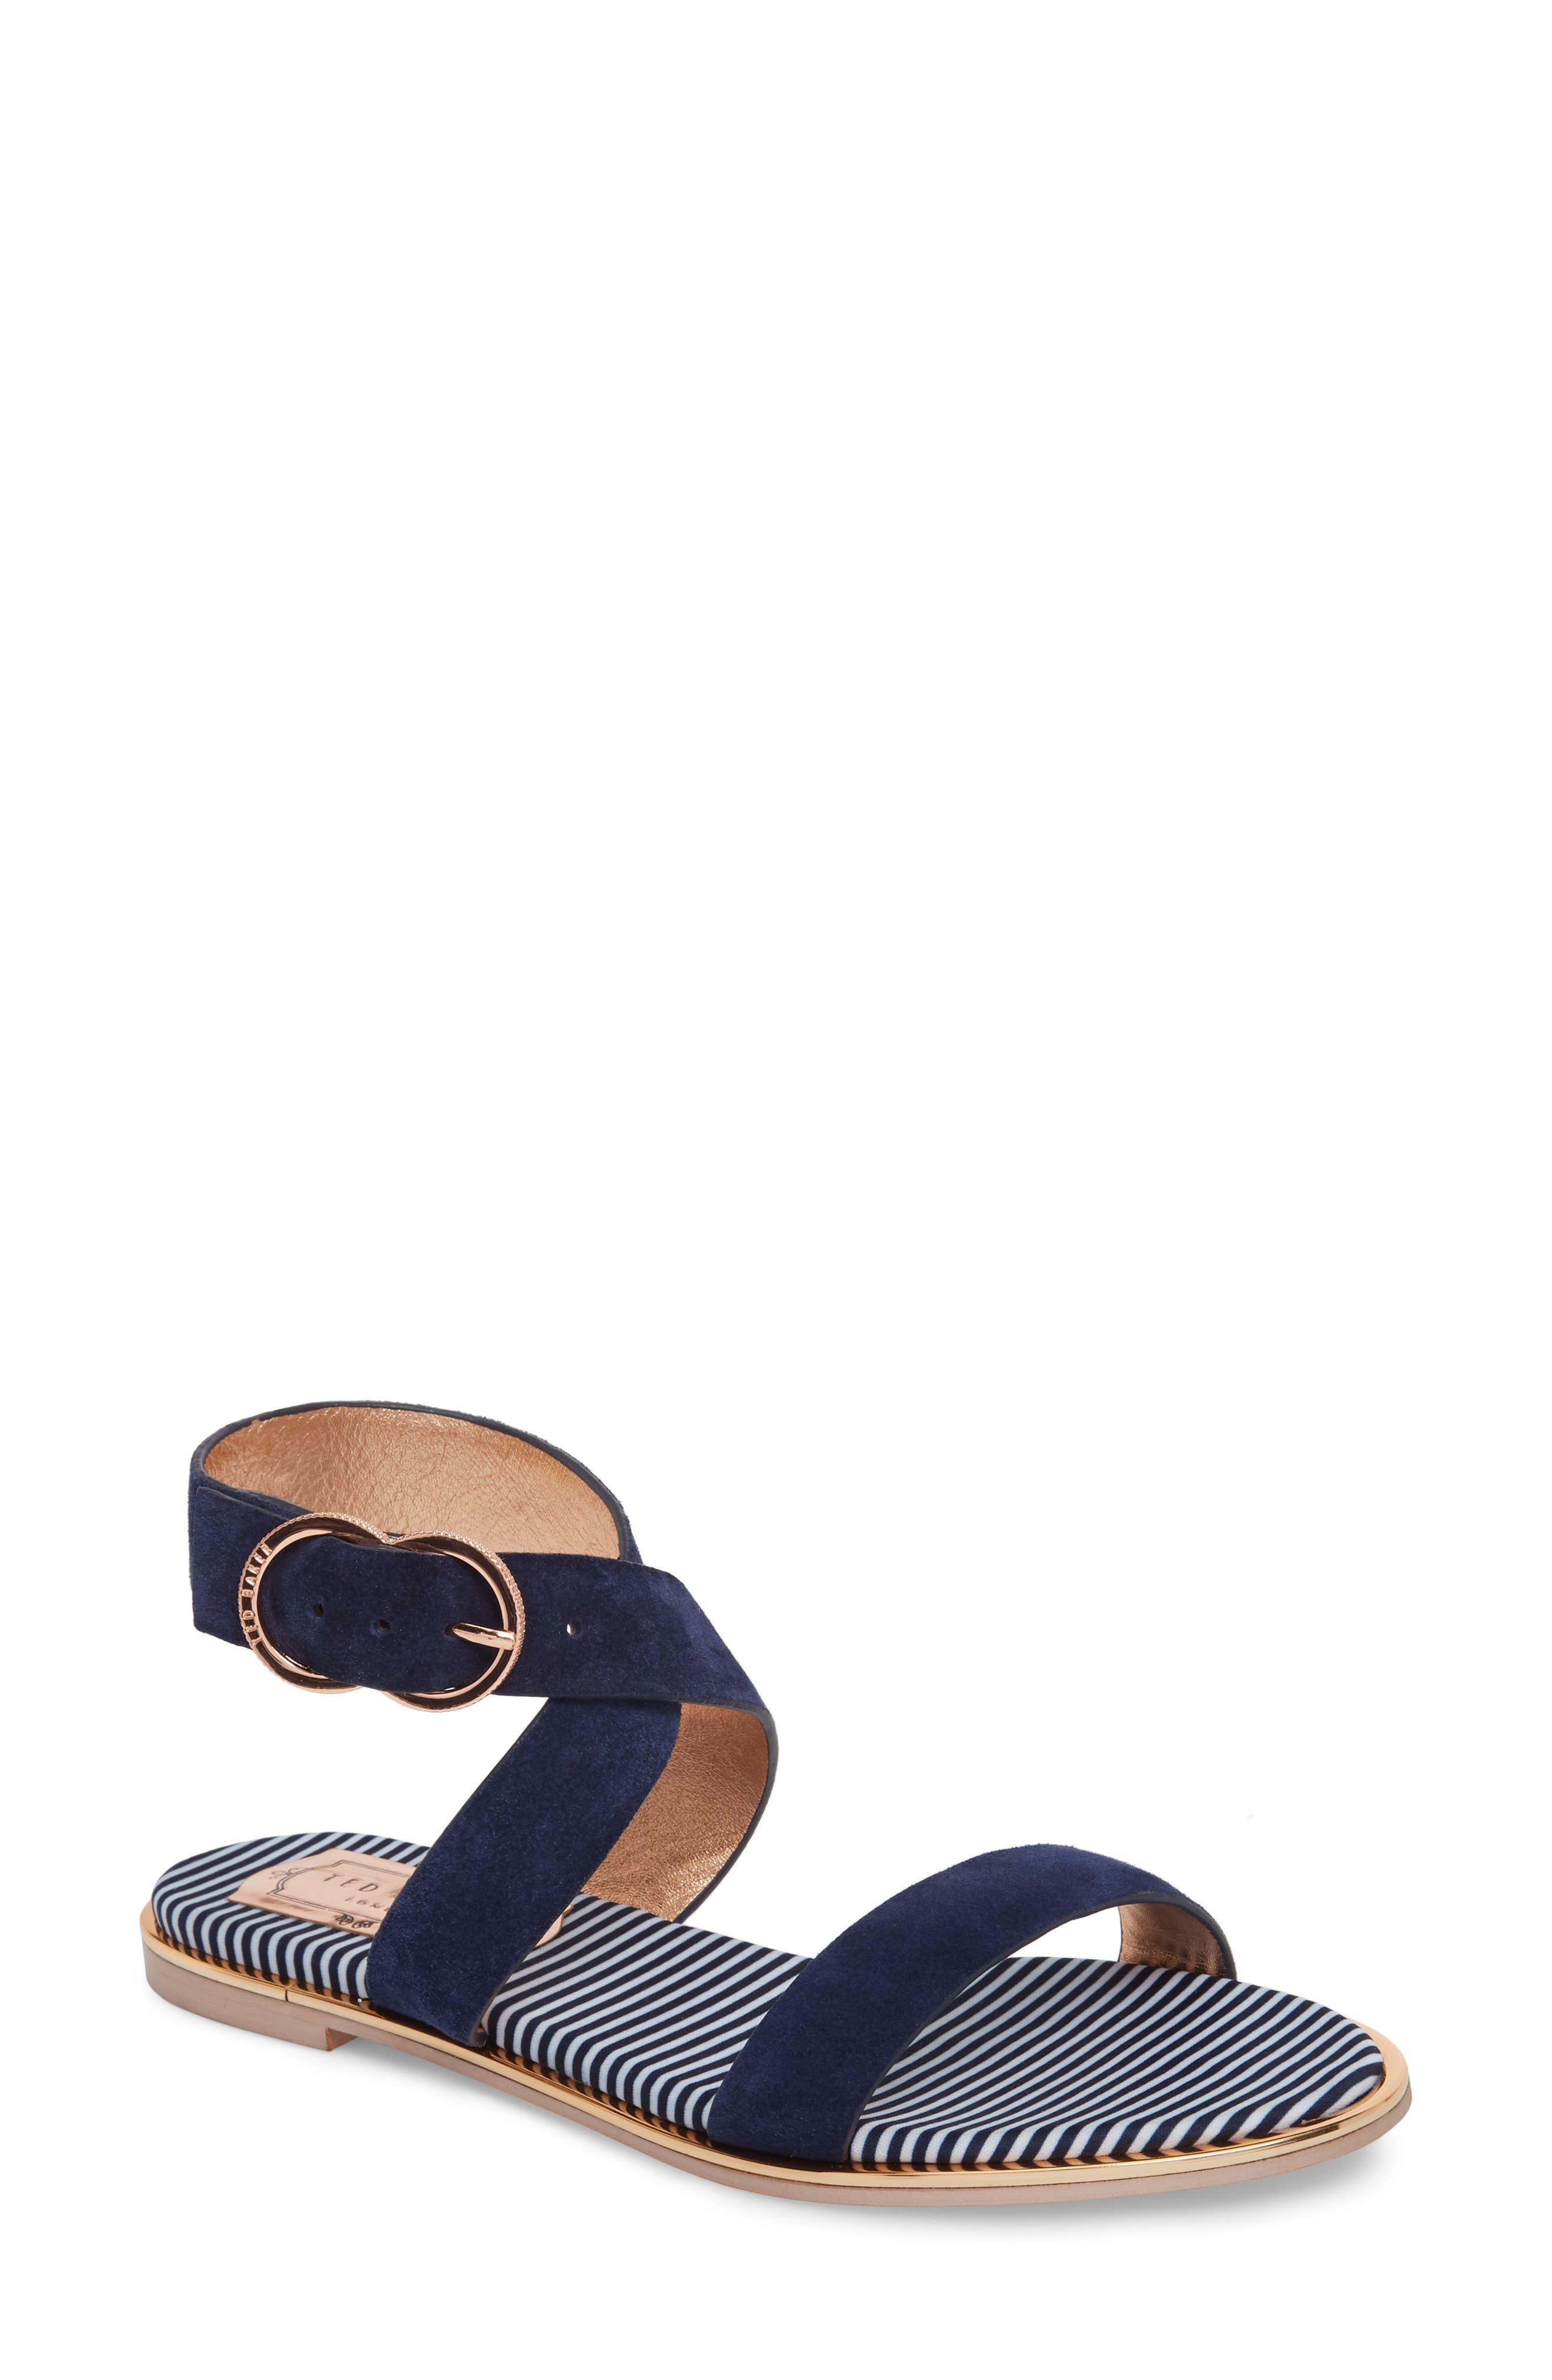 Qeredas Sandal,                         Main,                         color, Navy Suede